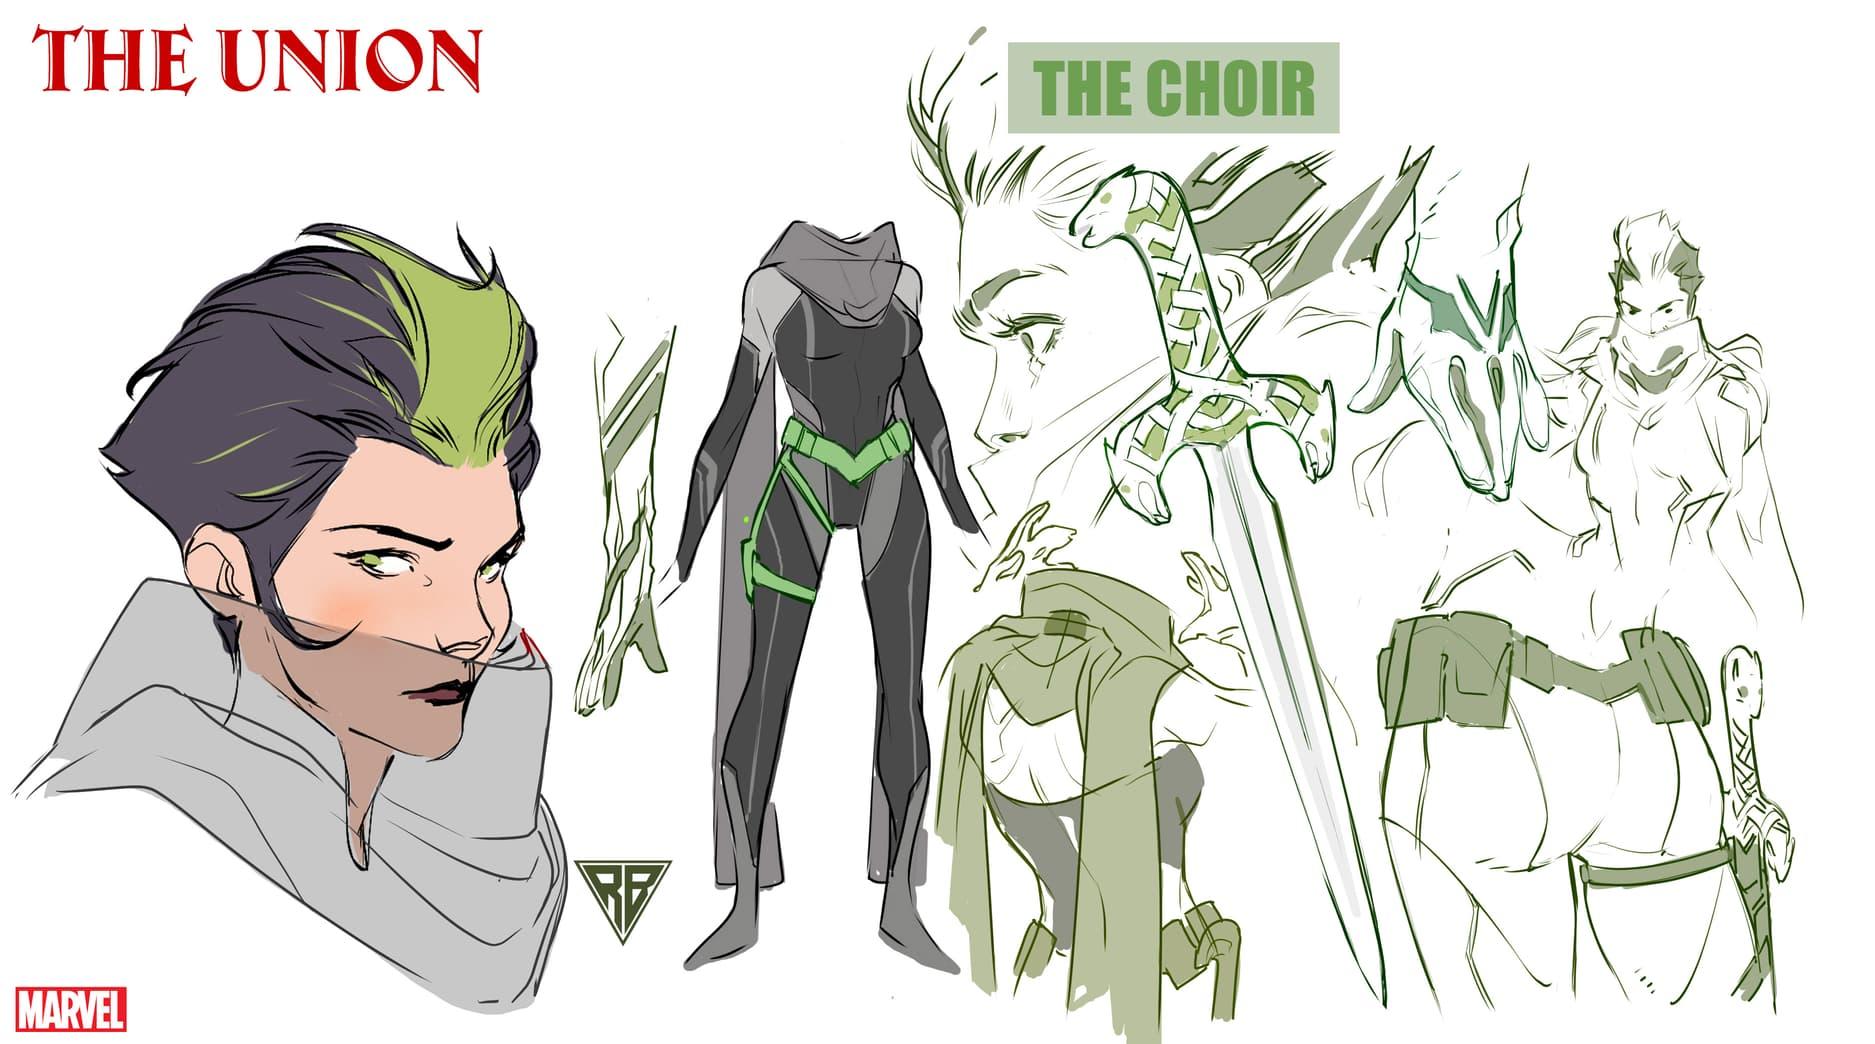 The Choir character design by R.B. Silva